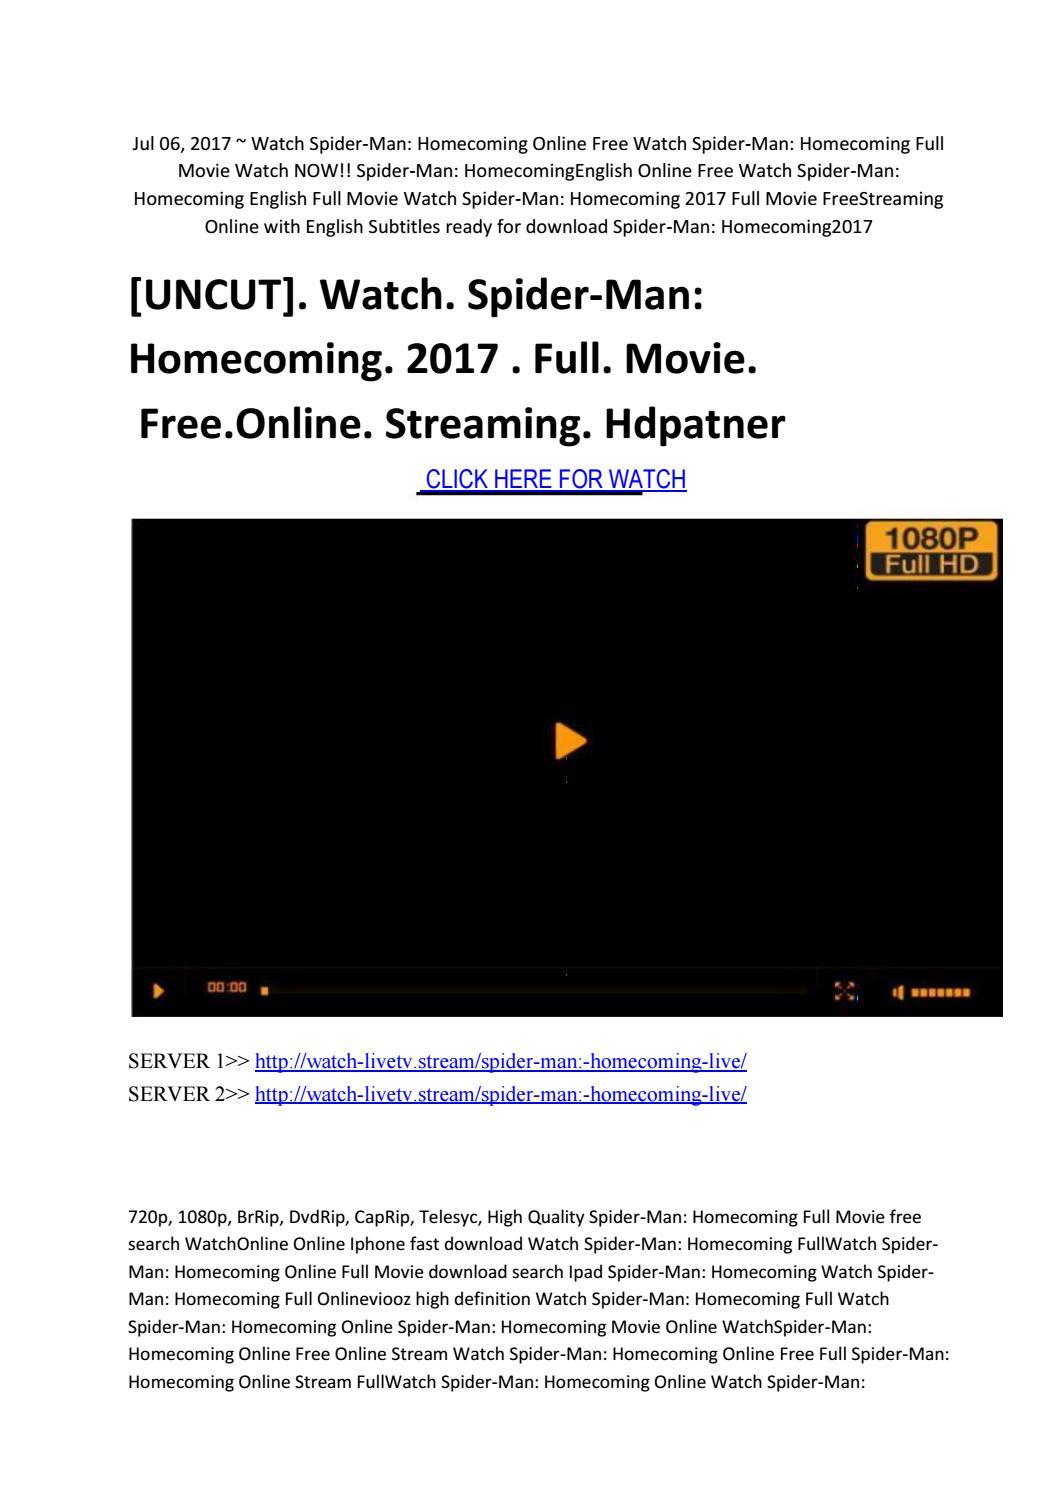 Spider Man Homecoming Vf Streaming : spider, homecoming, streaming, Watch, Spider, Homecoming, Movie, Online, Streaming, Hdpatner, Gentlemanfks, Issuu